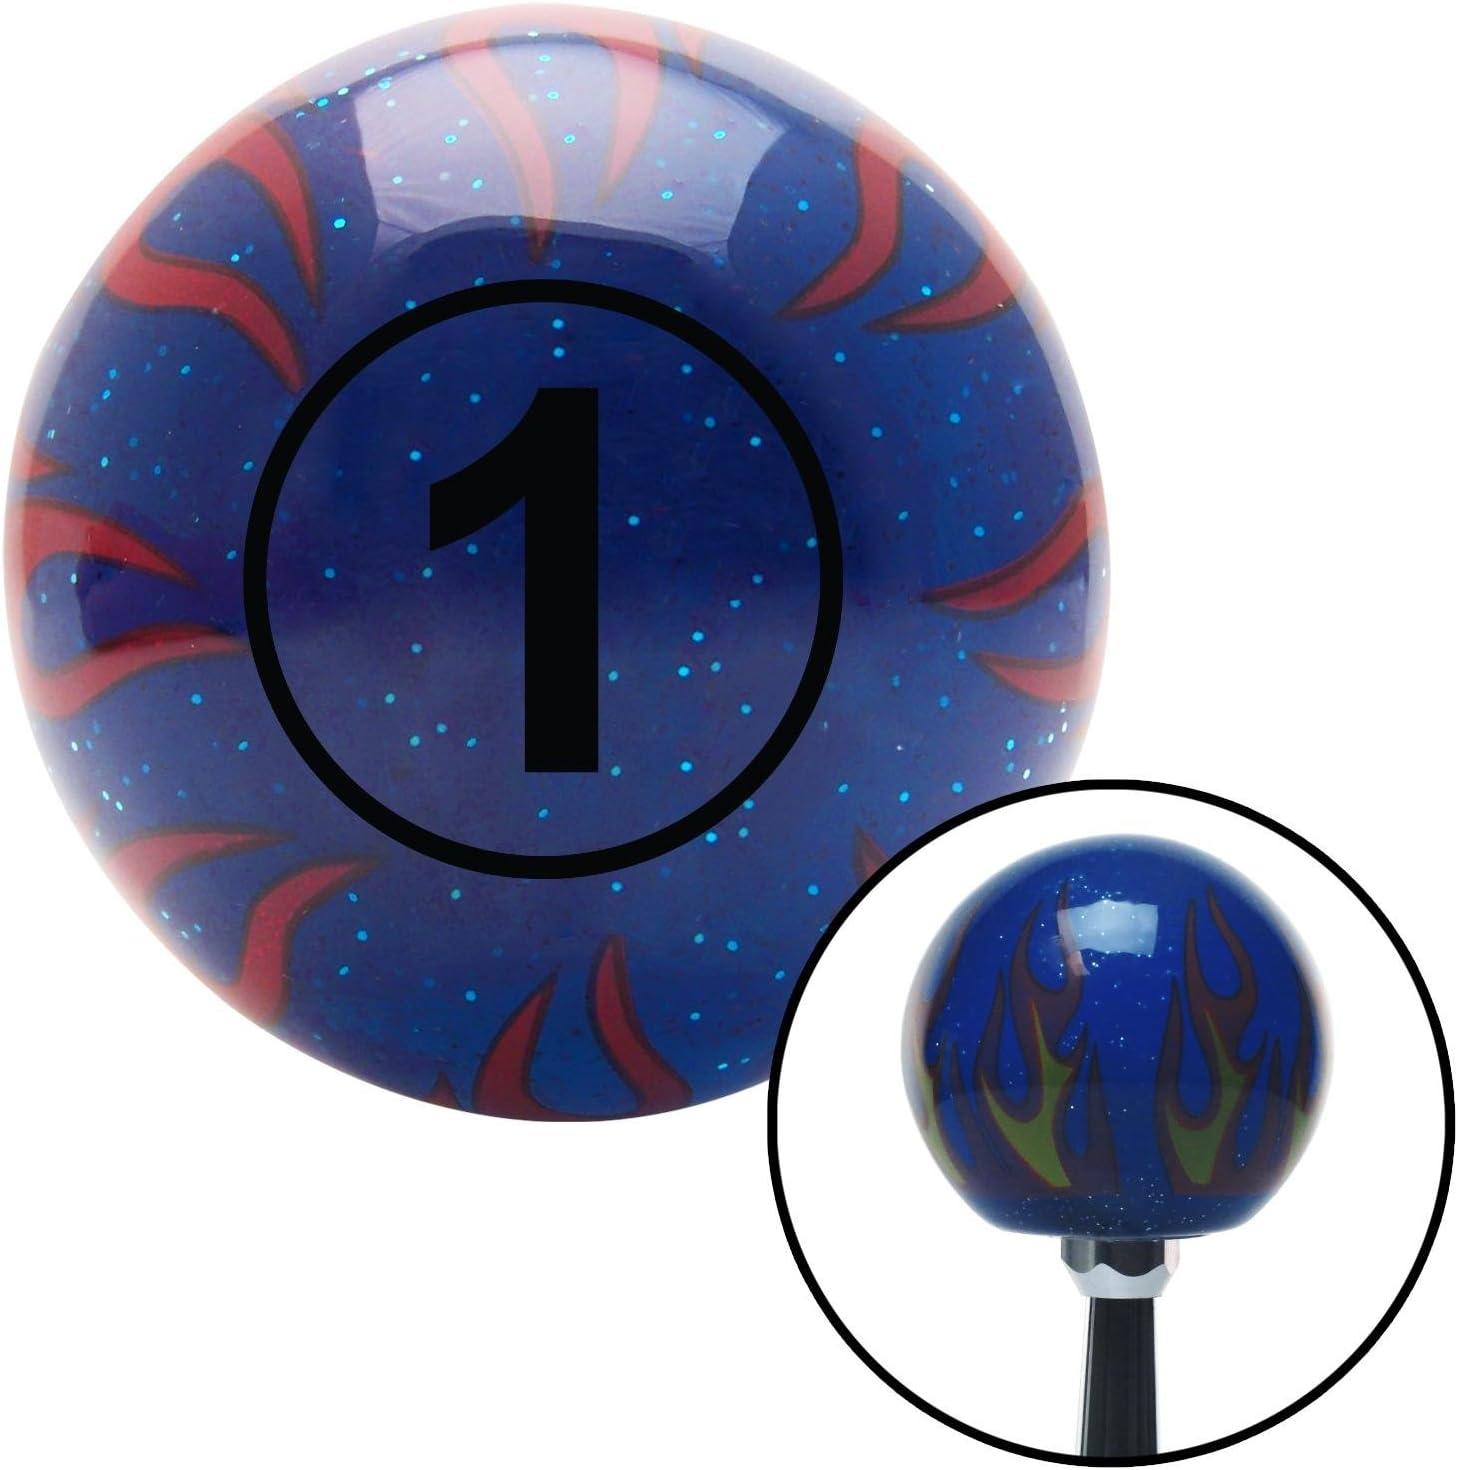 Black Ball #1 American Shifter 244509 Blue Flame Metal Flake Shift Knob with M16 x 1.5 Insert